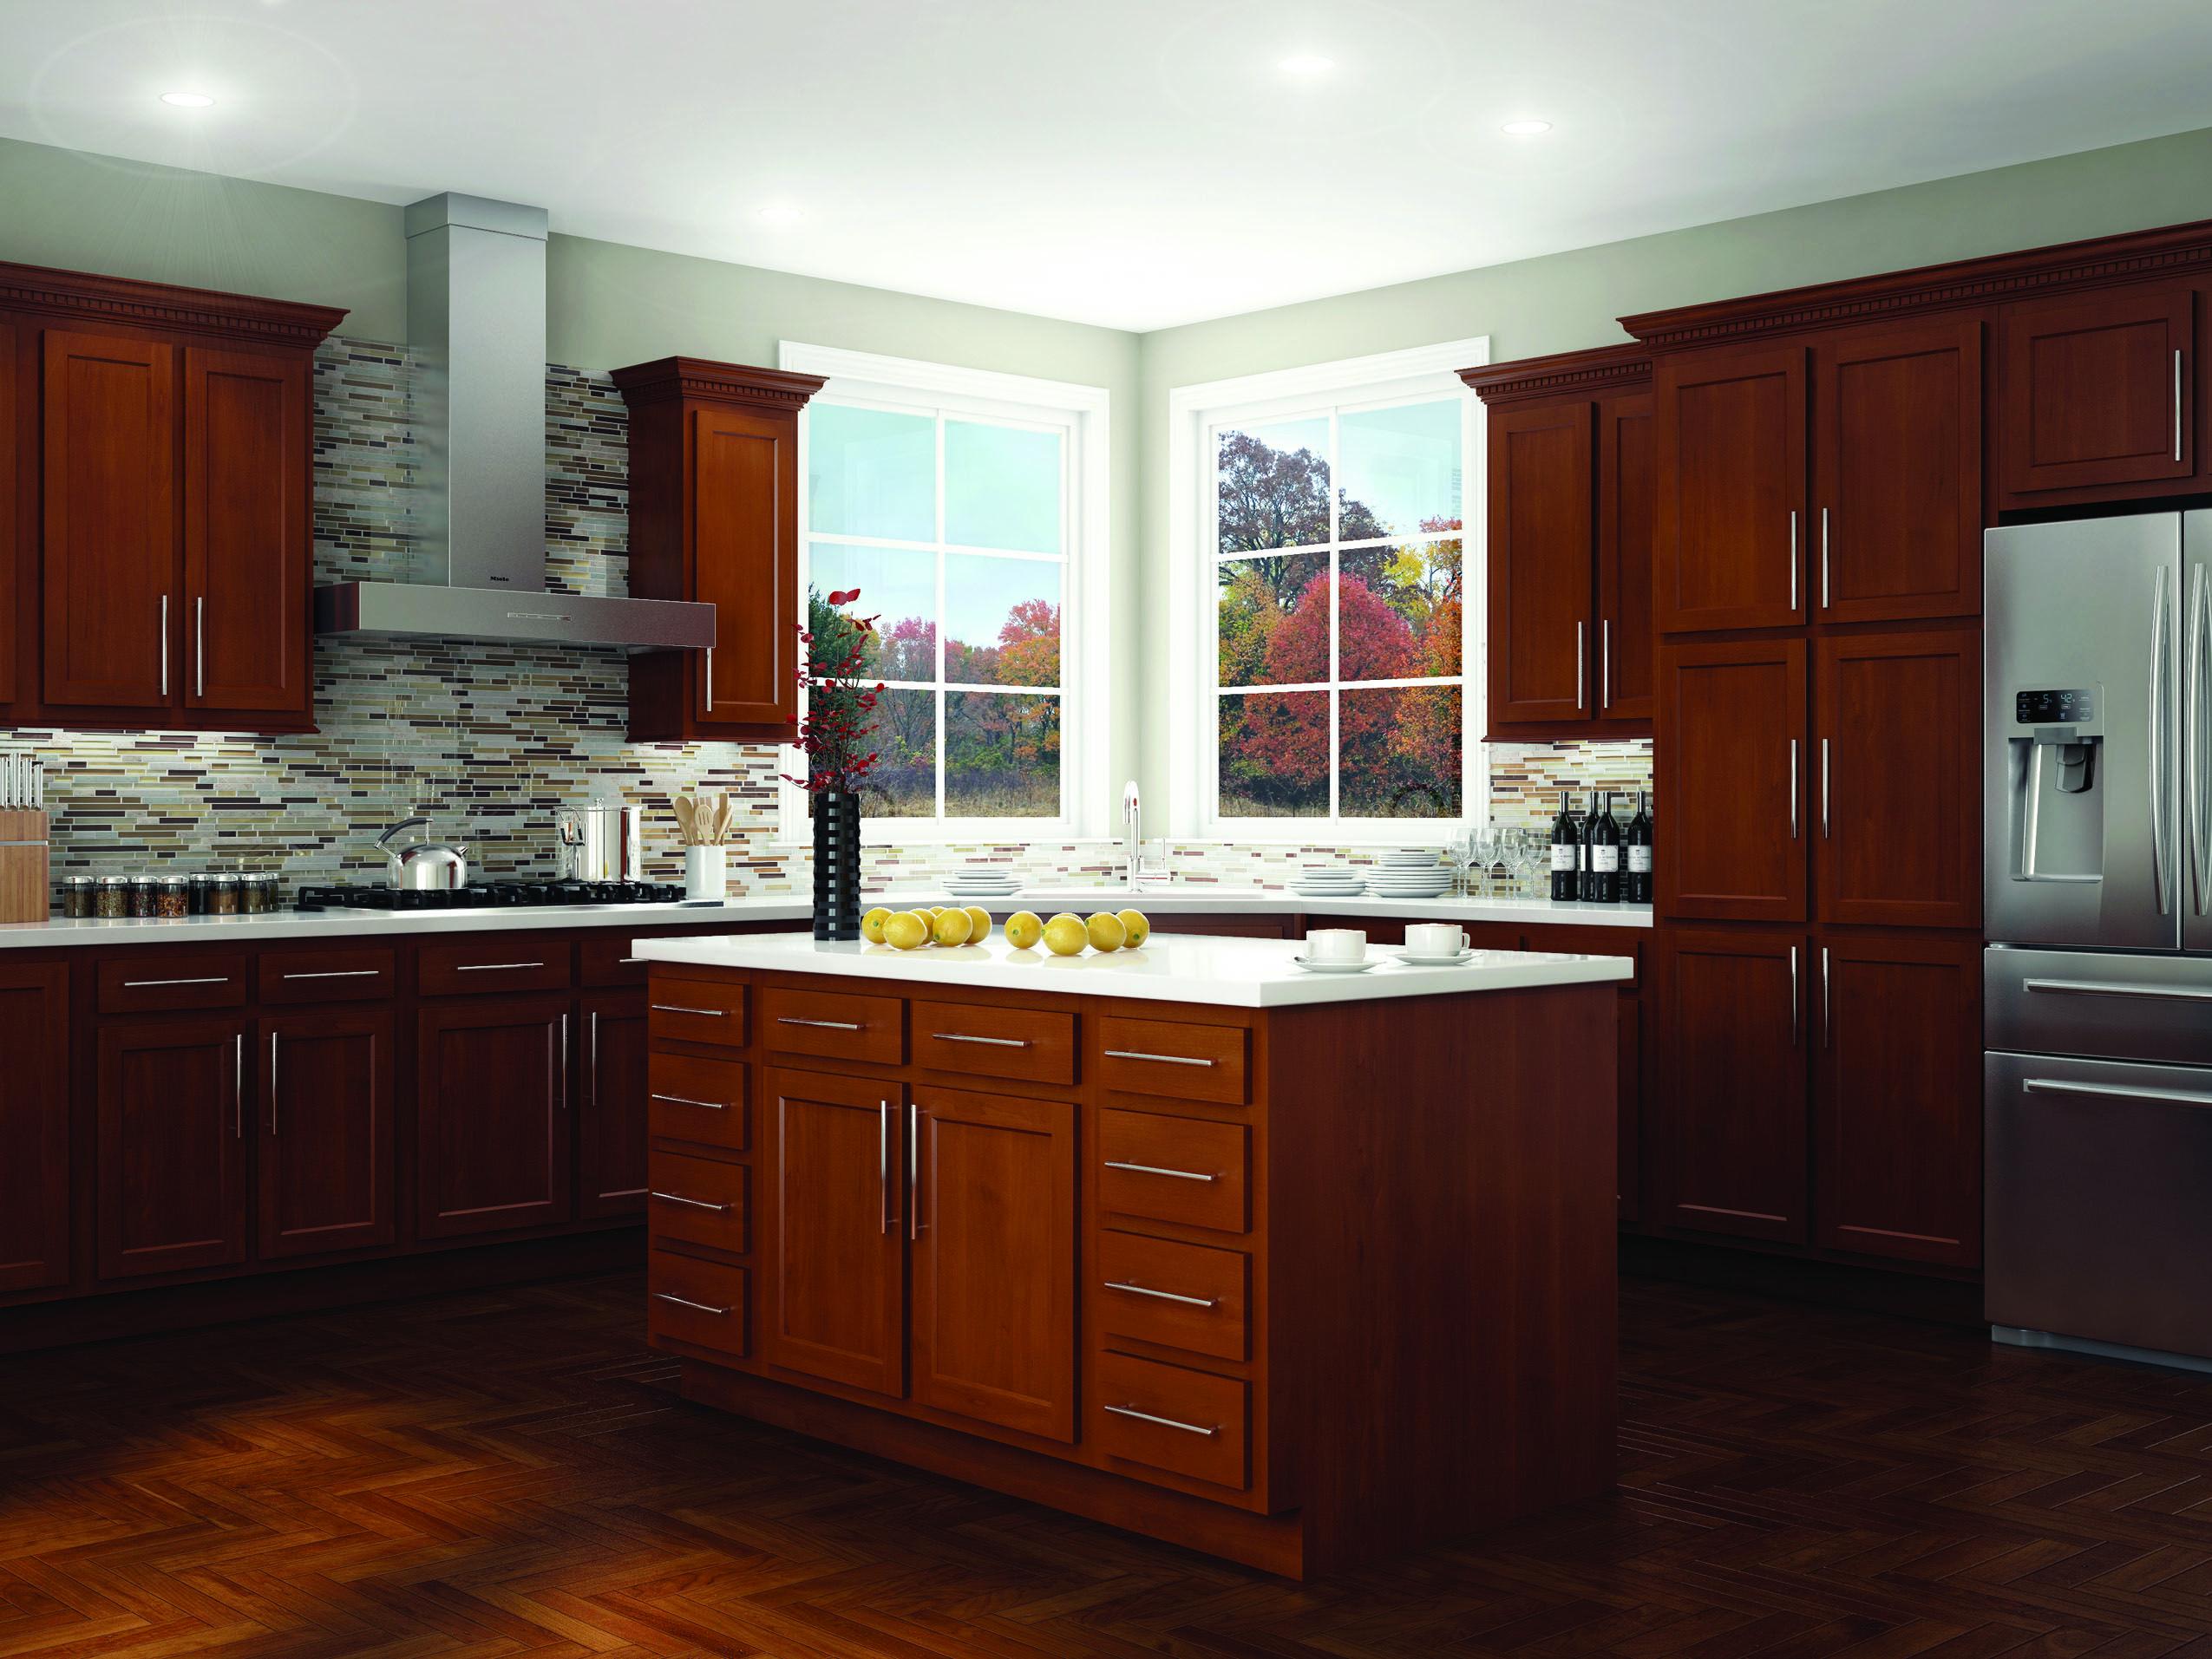 Kitchen Kompact Glenwood Beech Cabinets | Menards kitchen ...